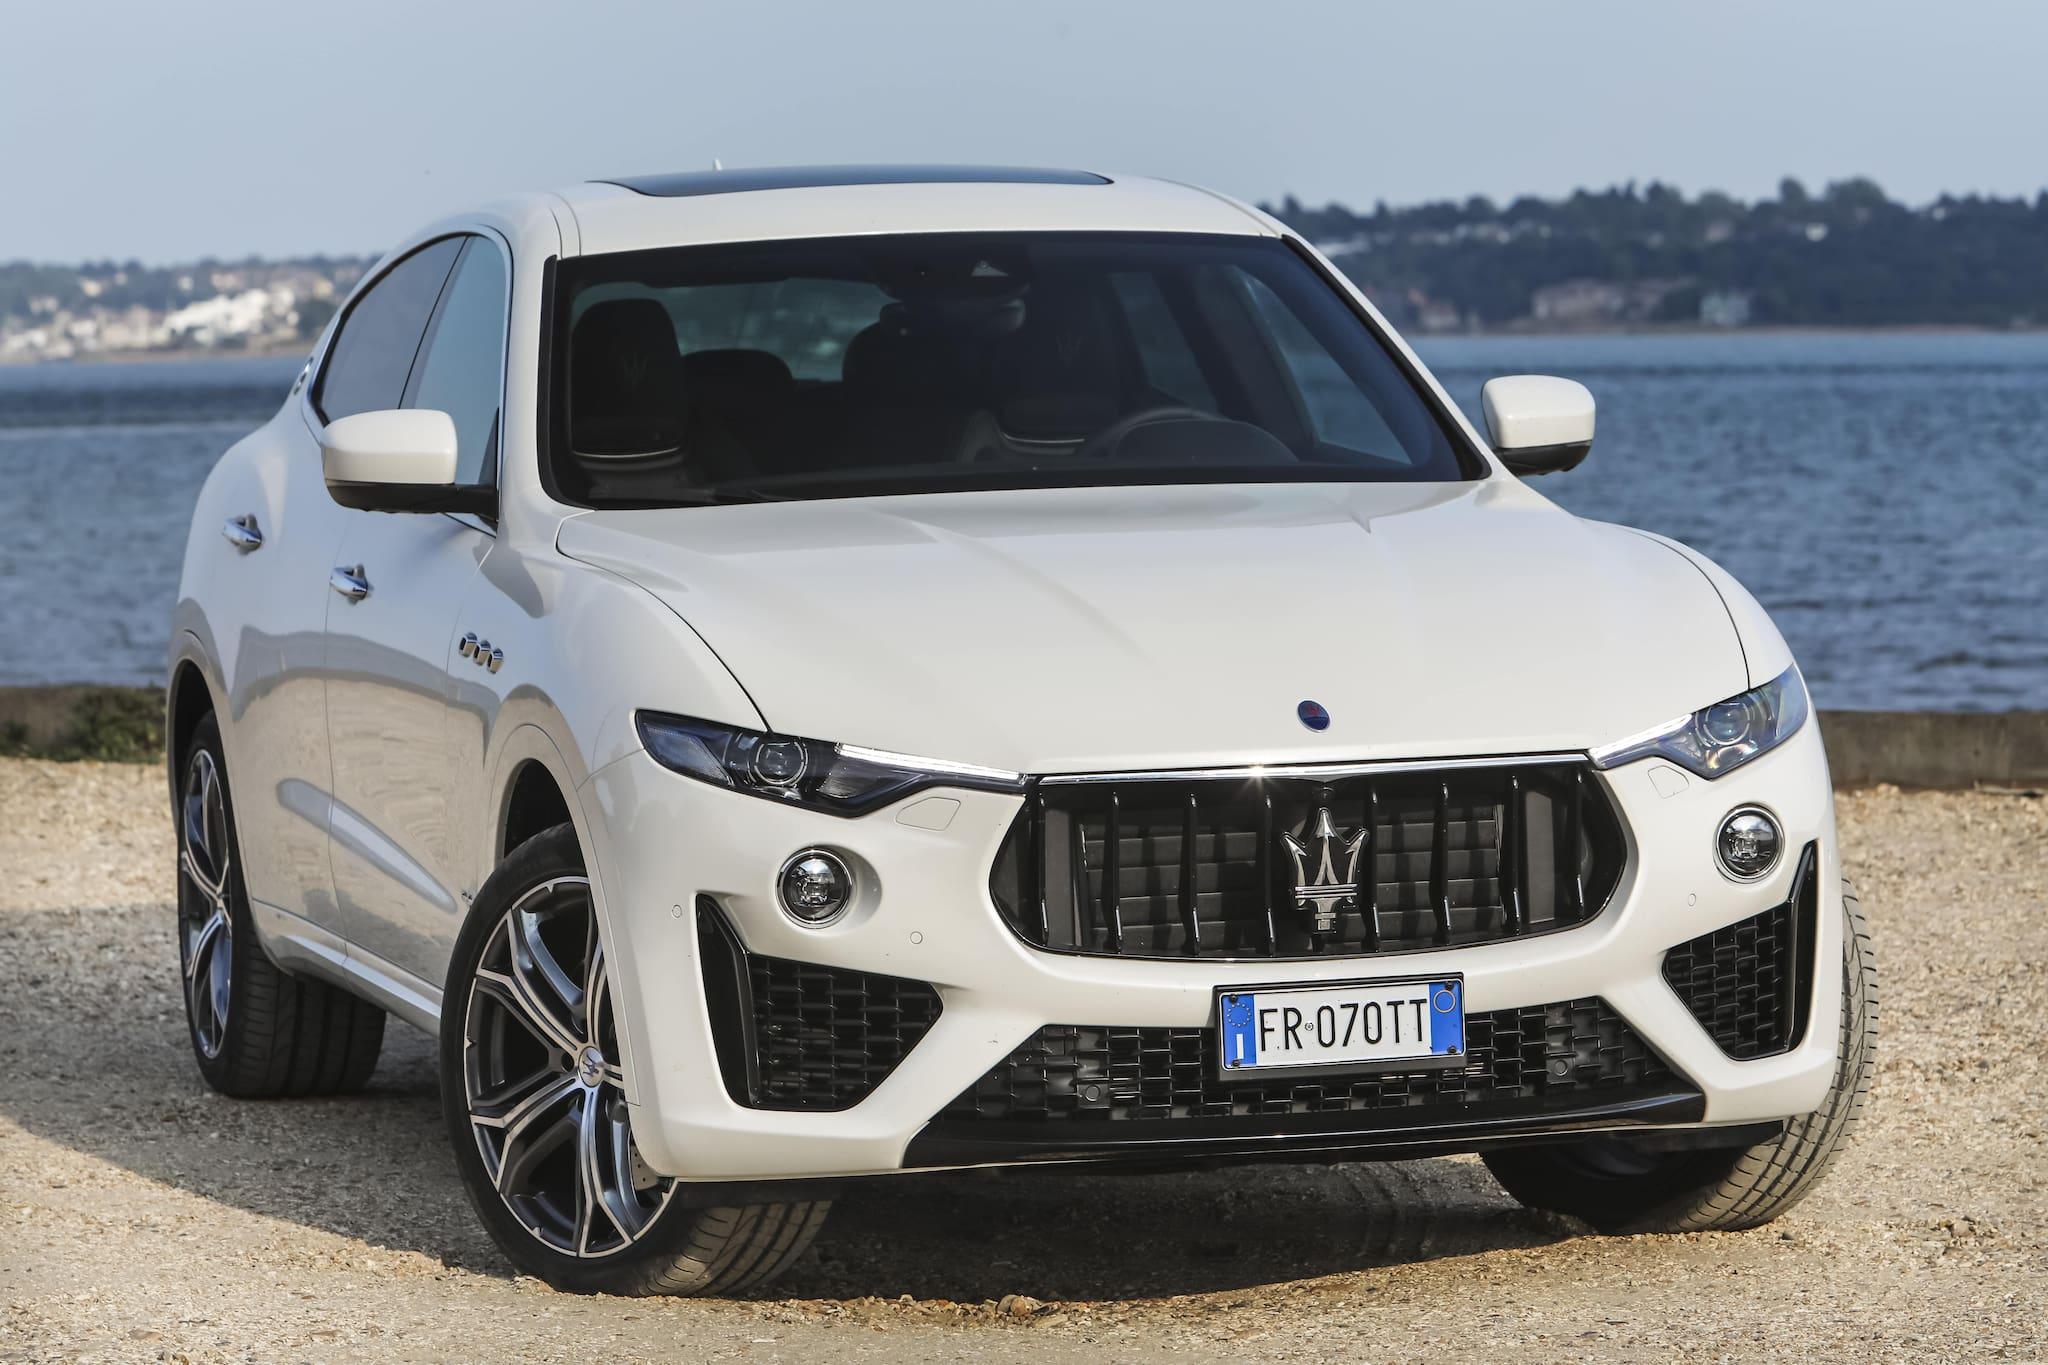 Maserati is Main Partner of Gran Premio Nuvolari 2018